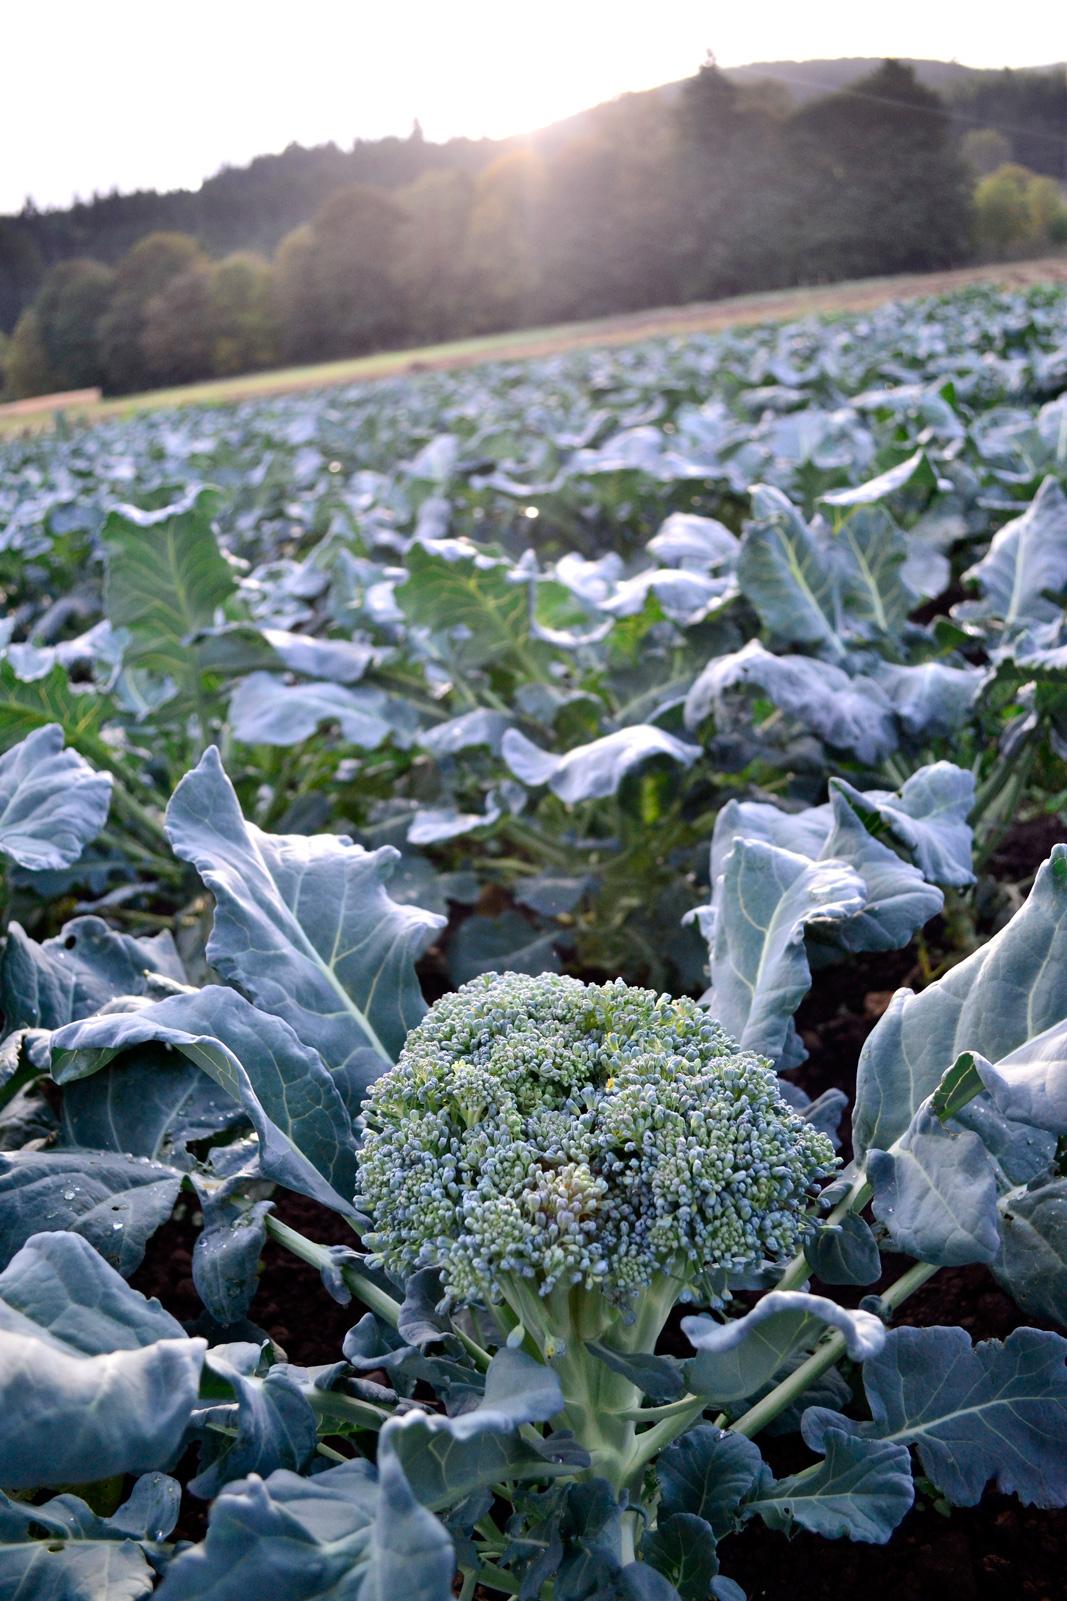 Broccoli: October 2014